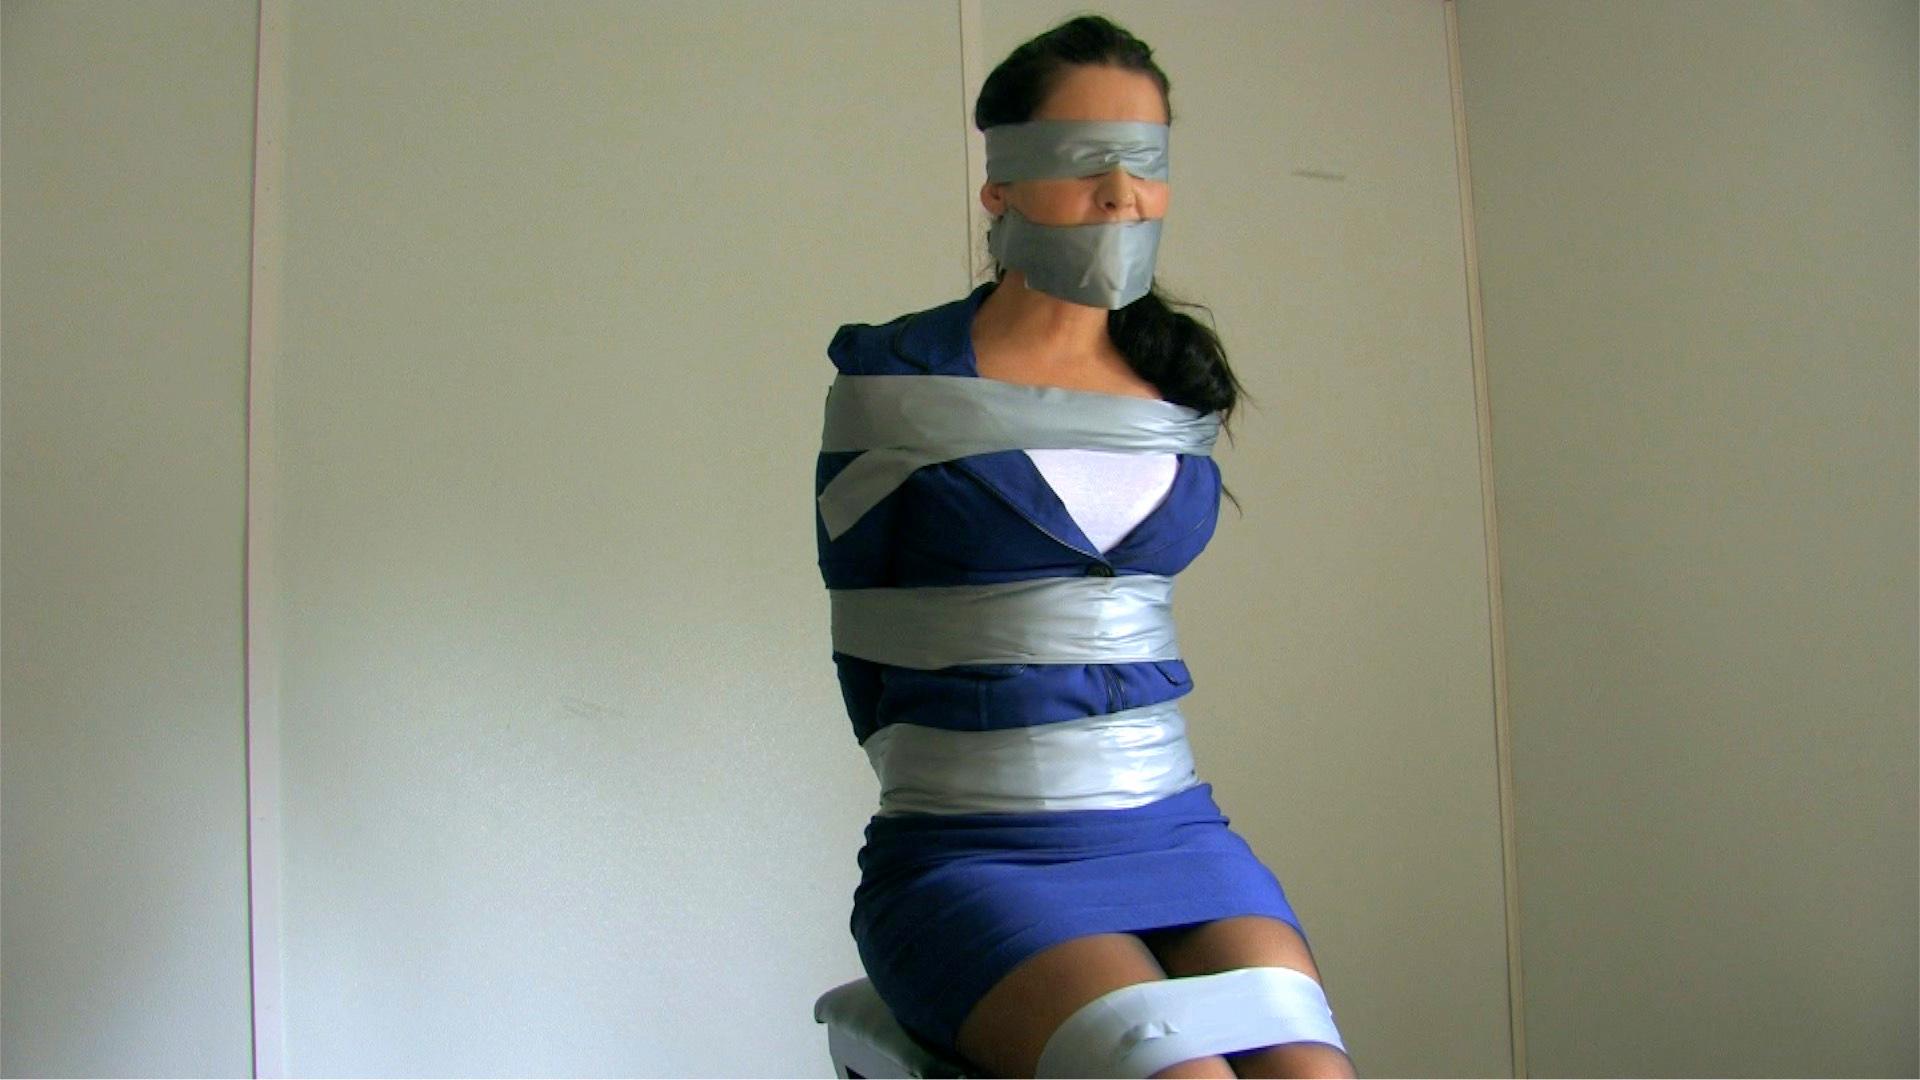 Leather Padded Hood Blindfold, Restraints Harness Mask, BDSM Bondage